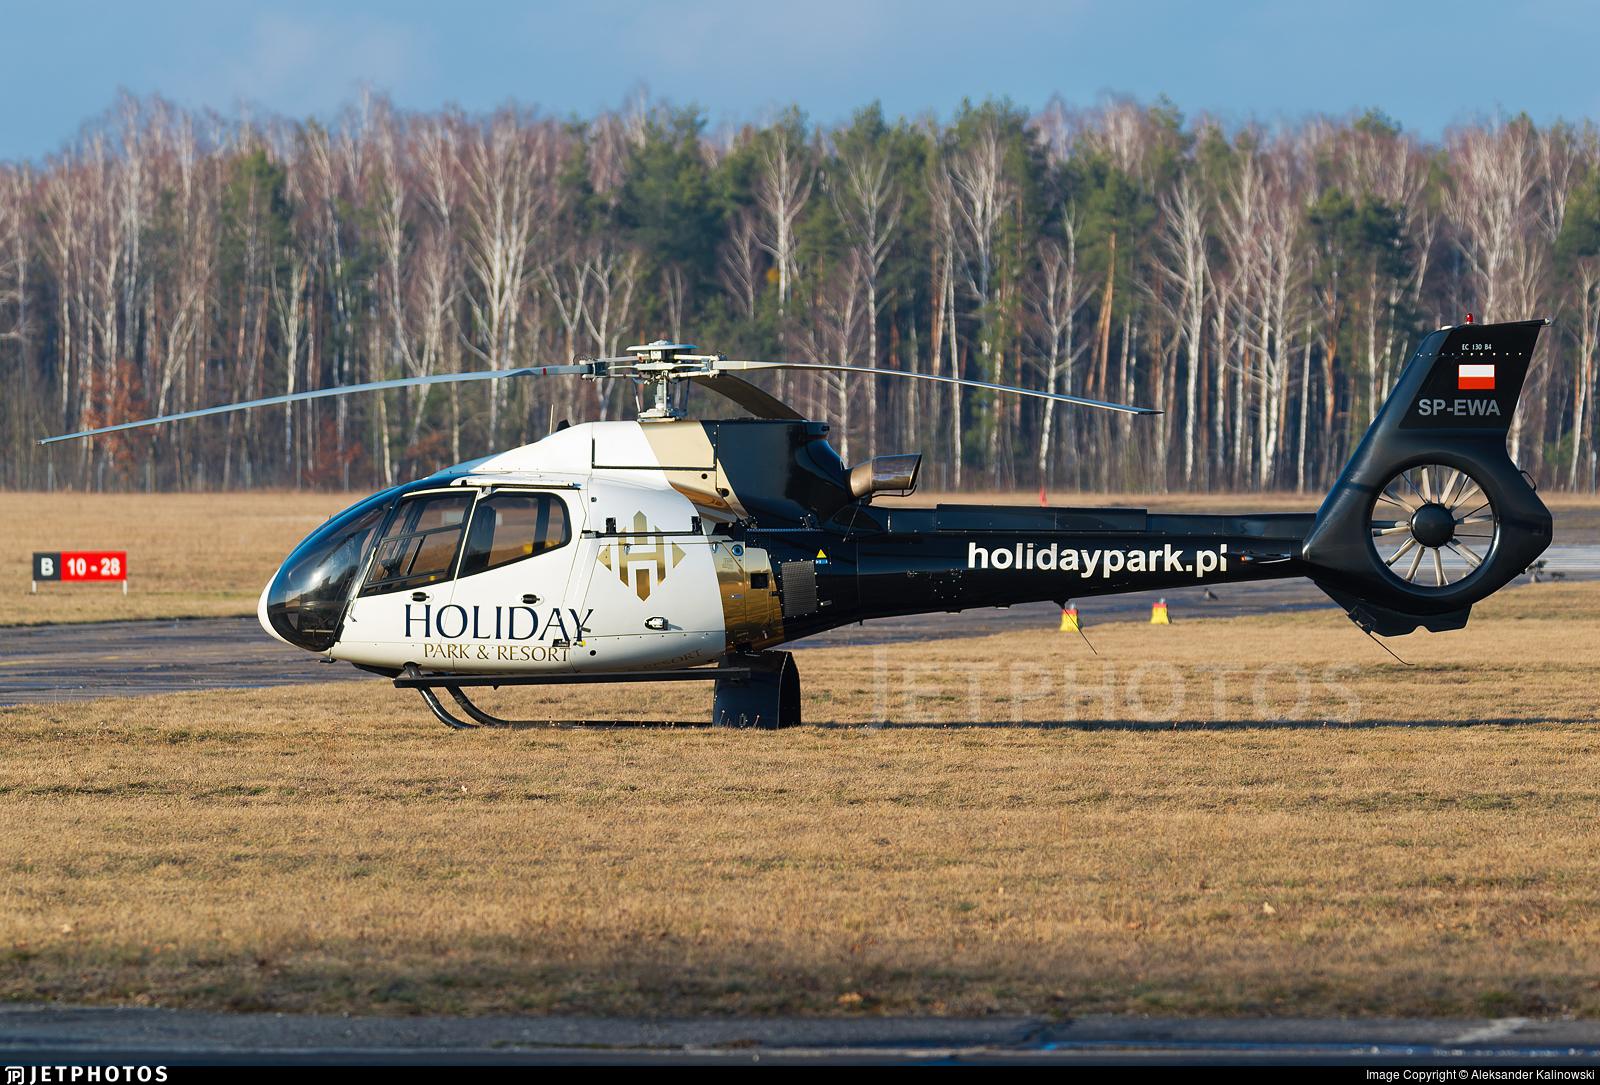 SP-EWA - Eurocopter EC 130B4 - Private